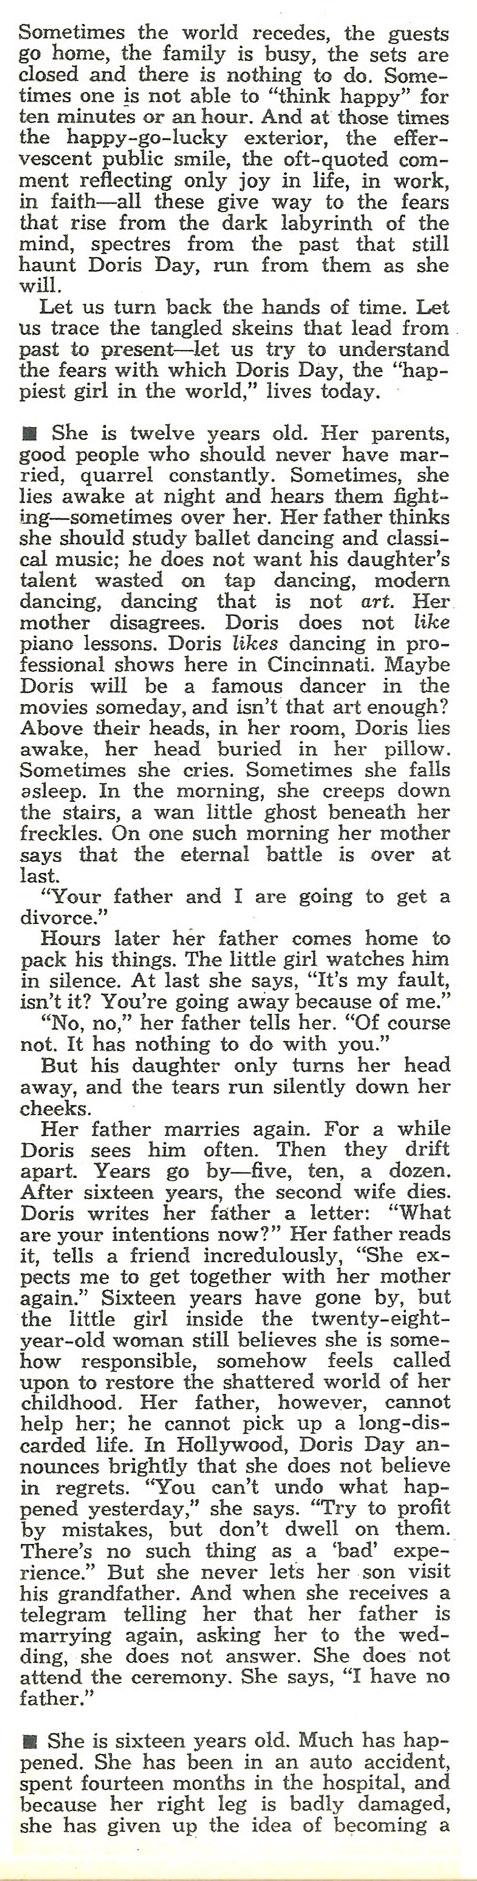 Doris Day #5